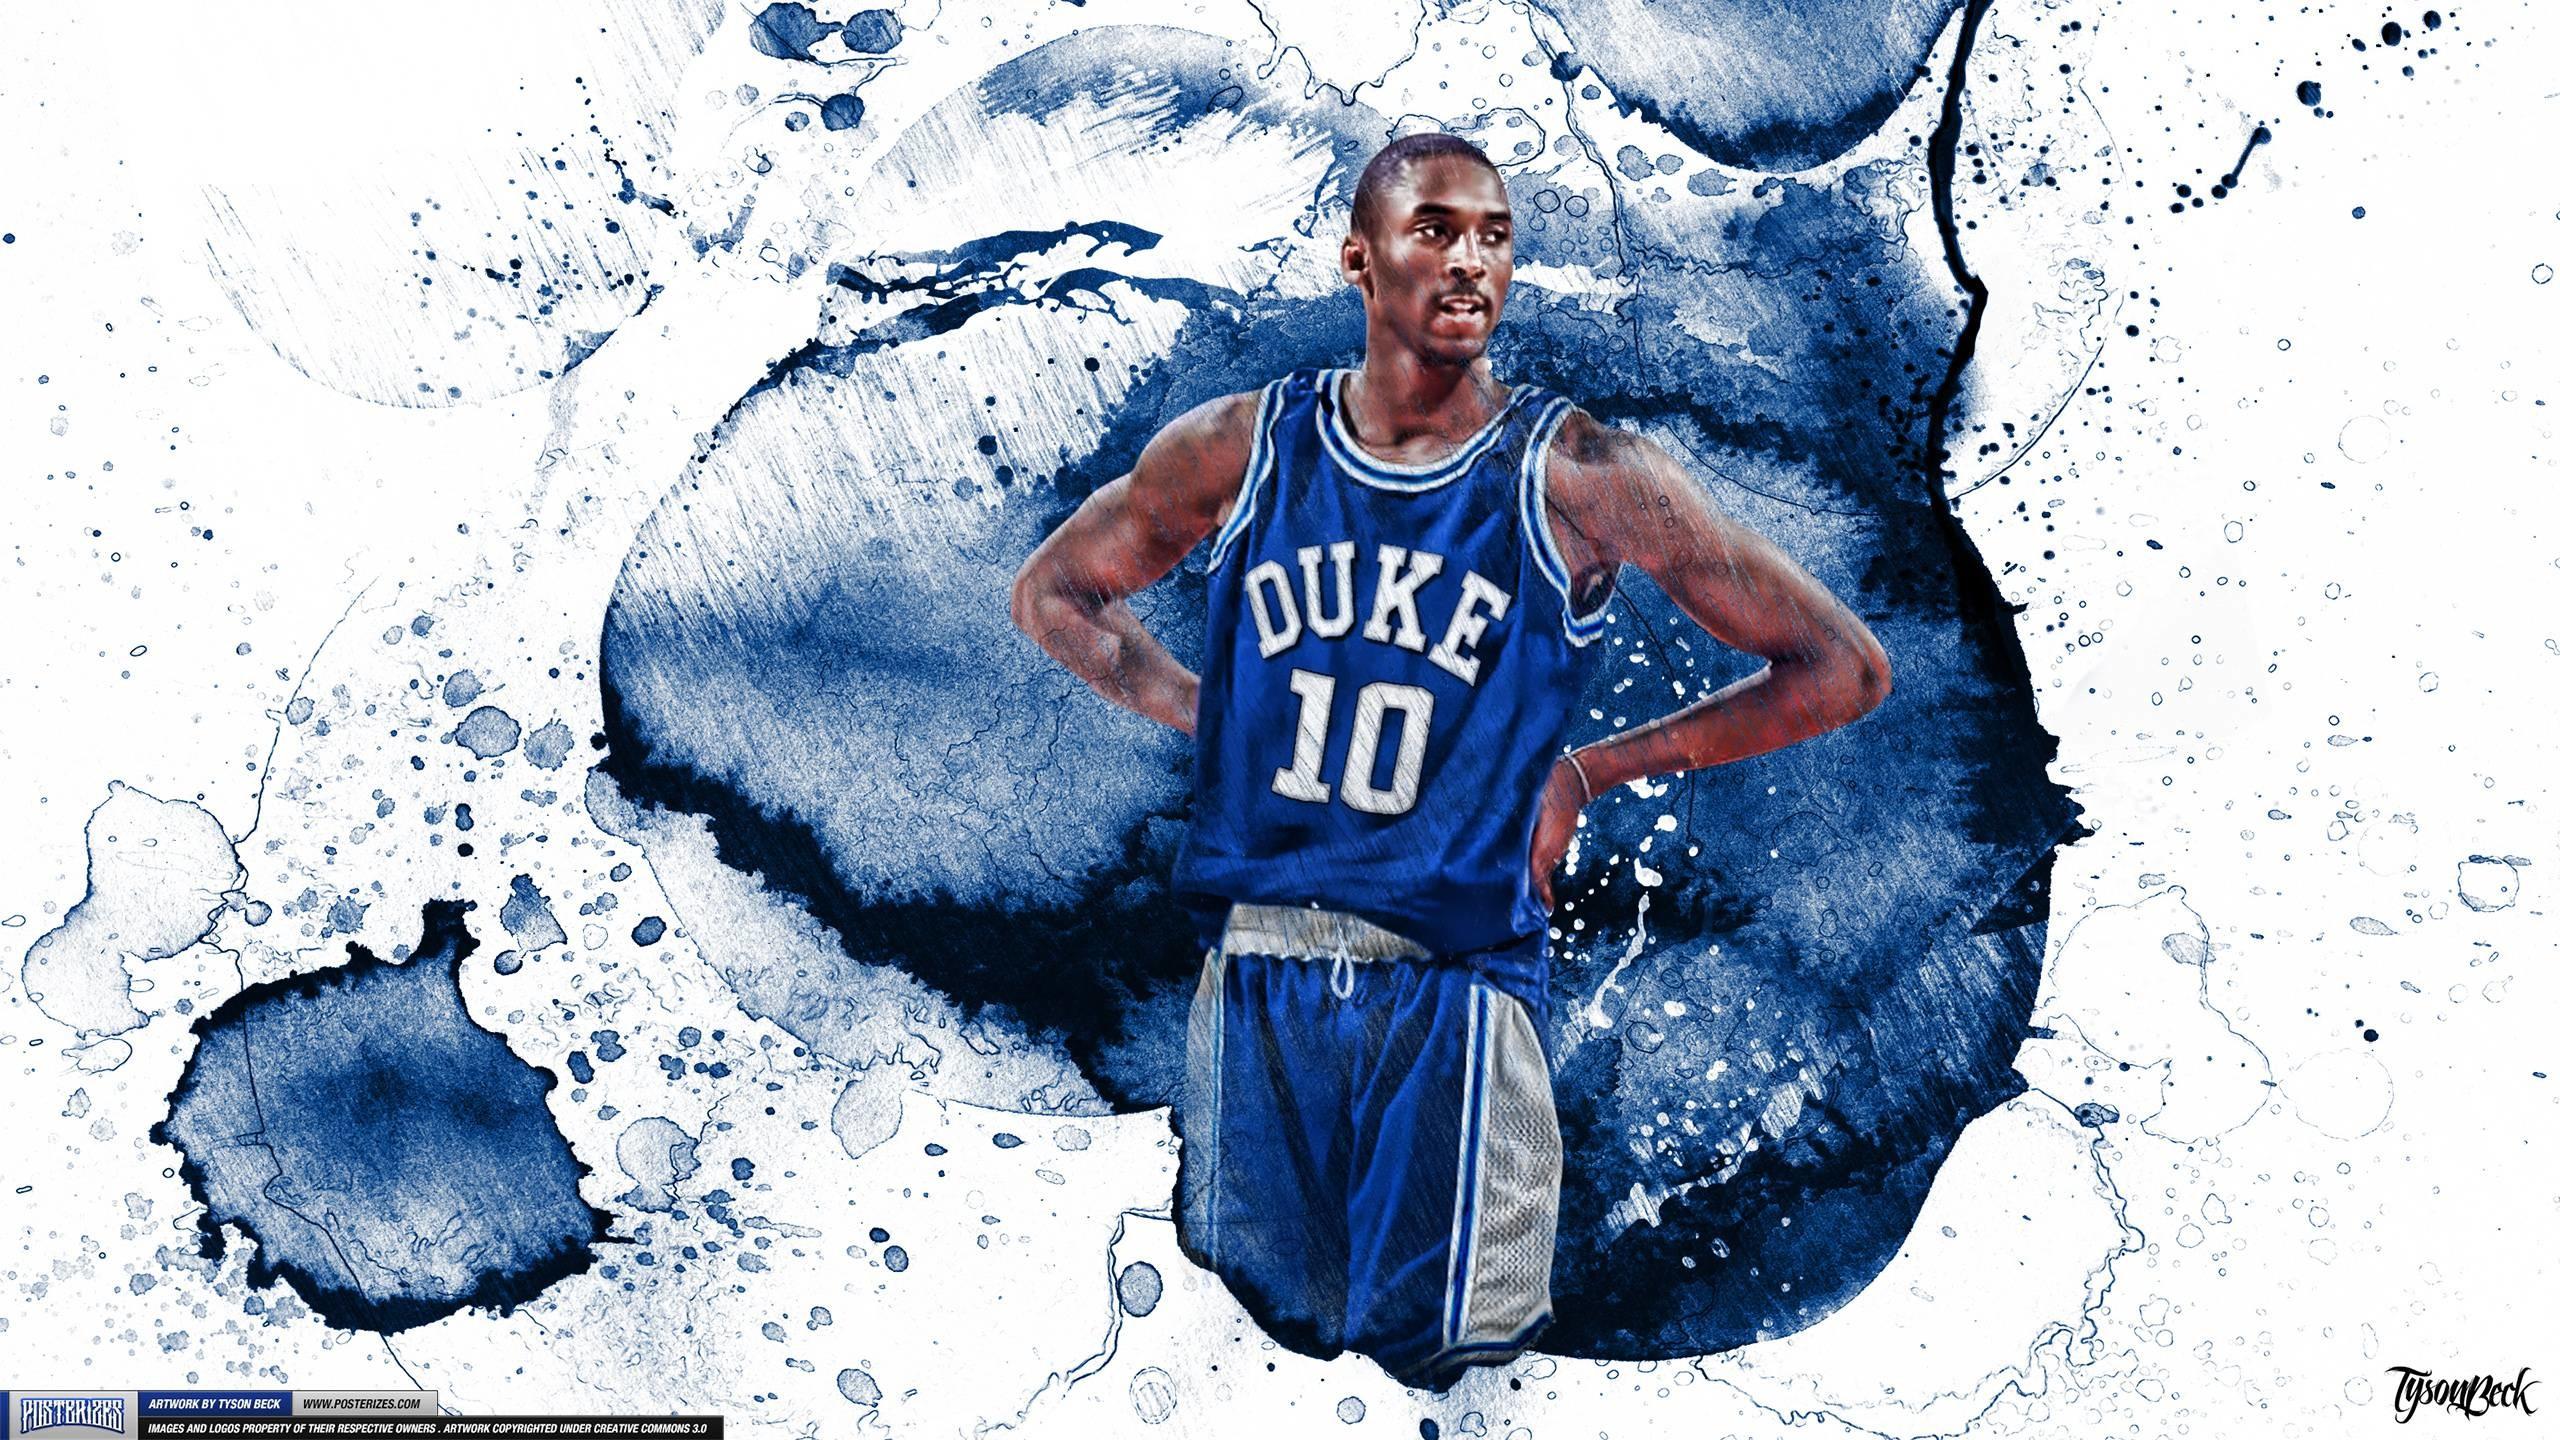 Duke Iphone Wallpaper 961 HD Wallpapers | wallpaperenew.